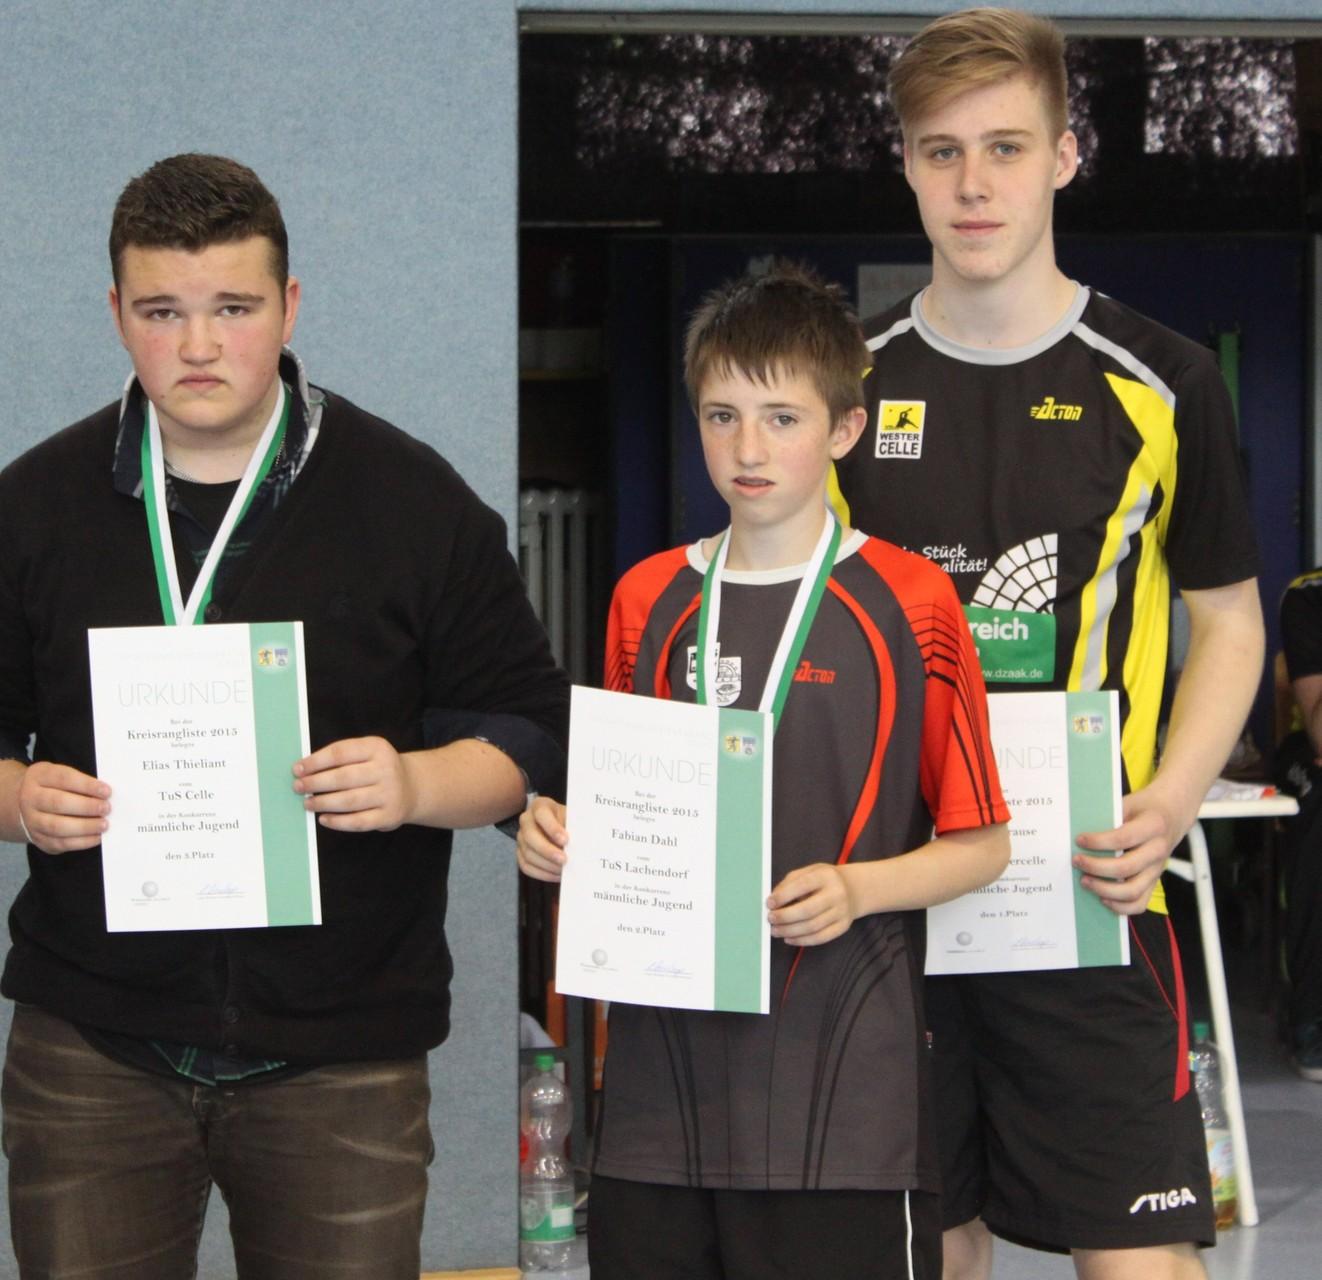 Sieger Jungen: v.l. Elias Thieliant, Fabian Dahl, Lukas Krause